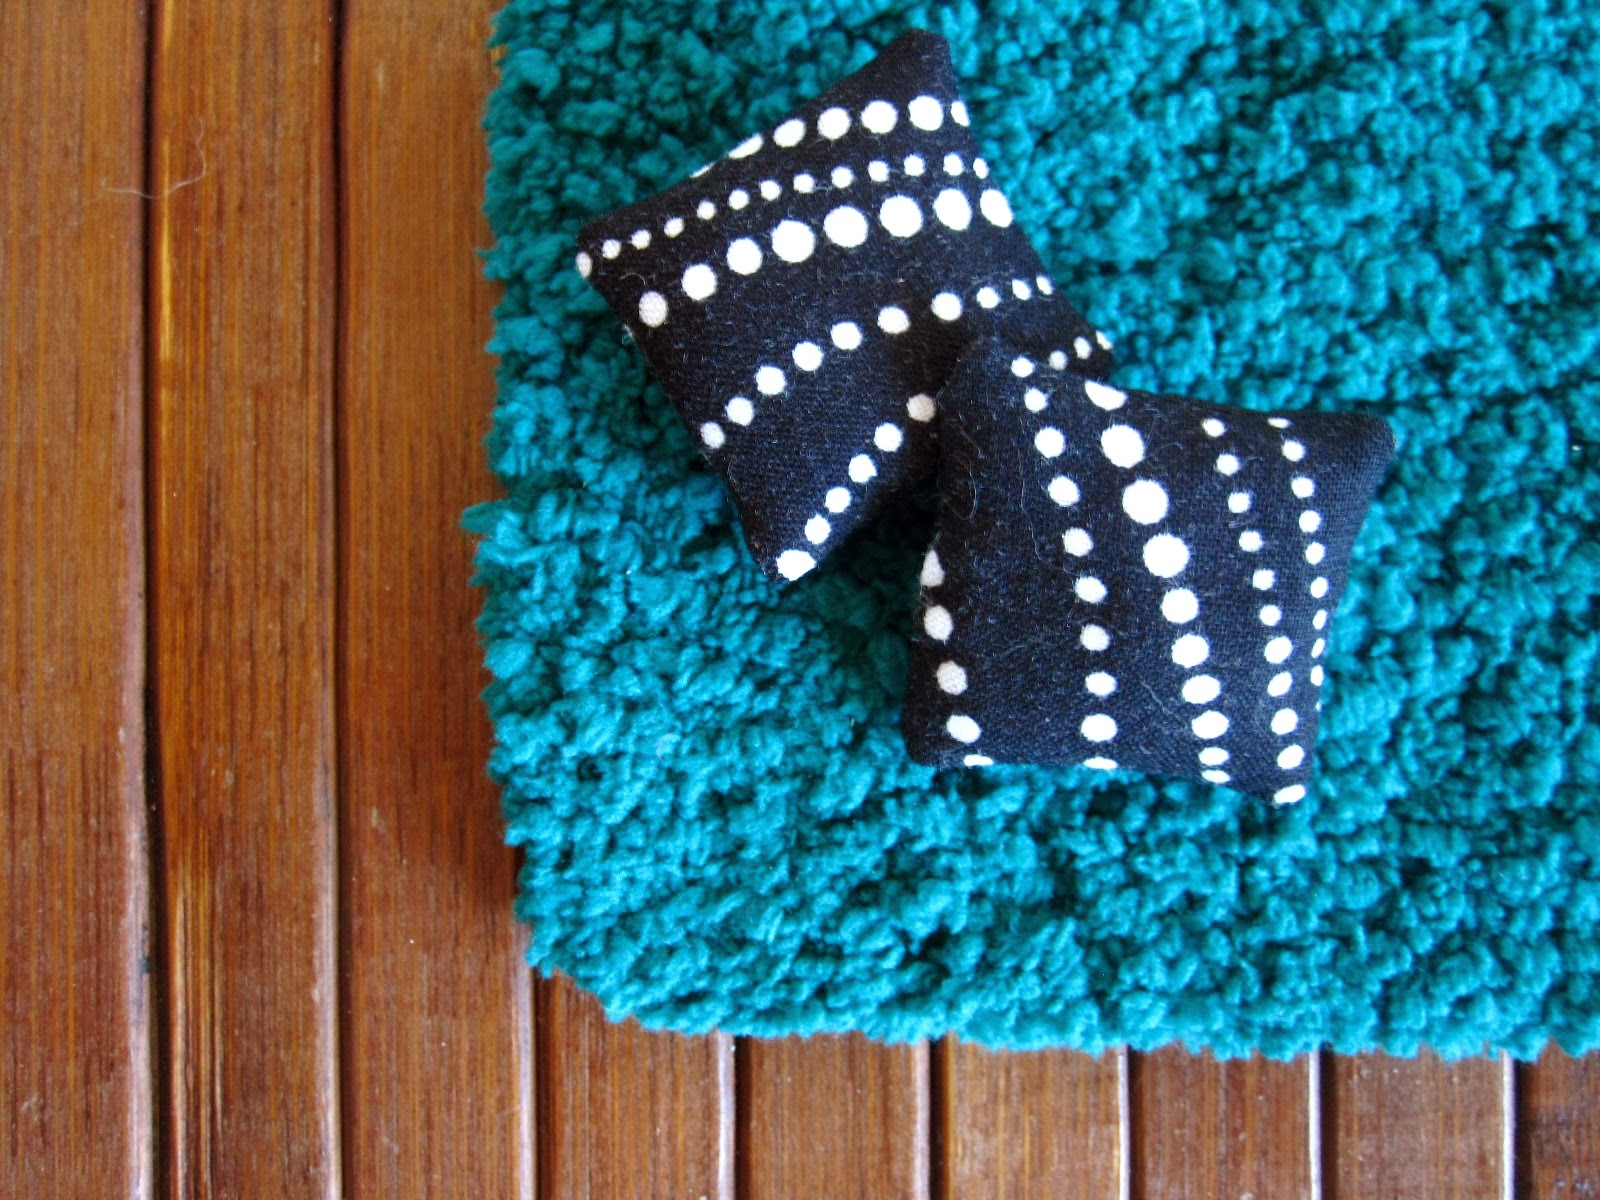 Modern miniature flokati-style rug in teal